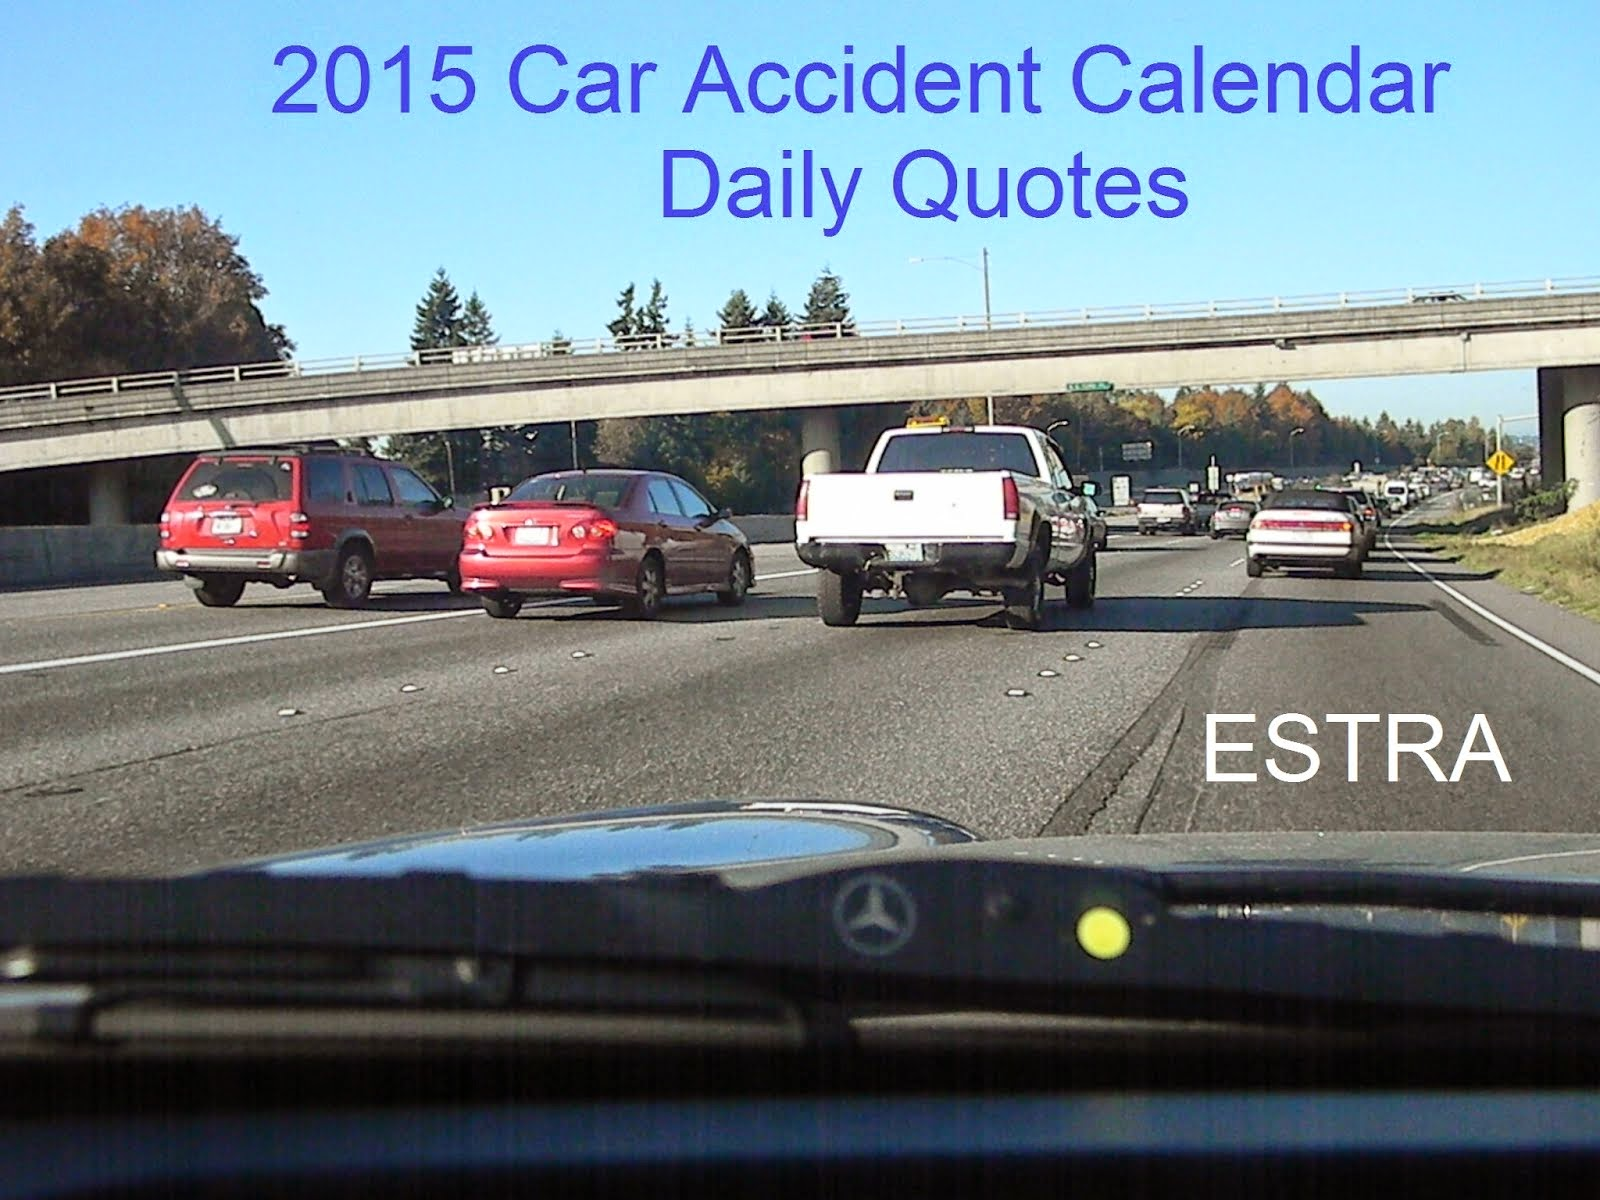 2015 Car Accident Calendars